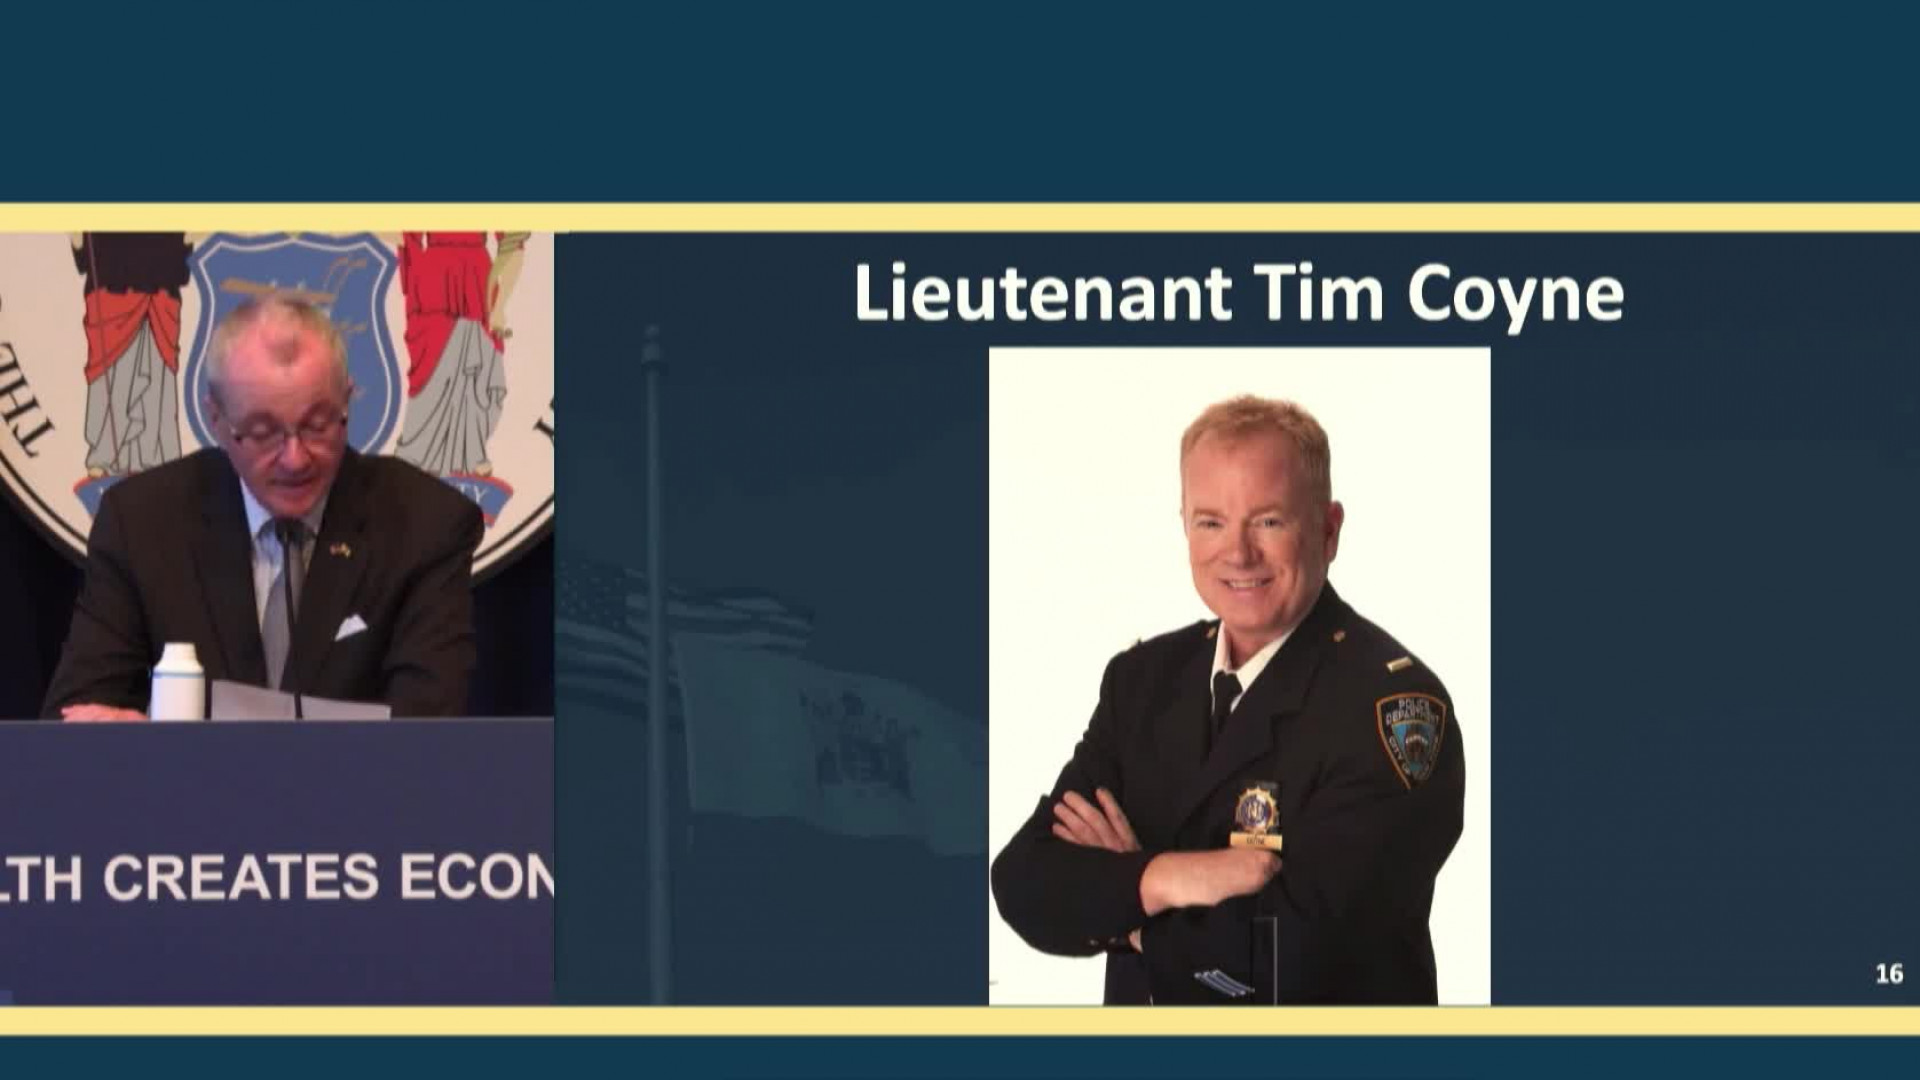 NYPD Lt. Tim Coyne